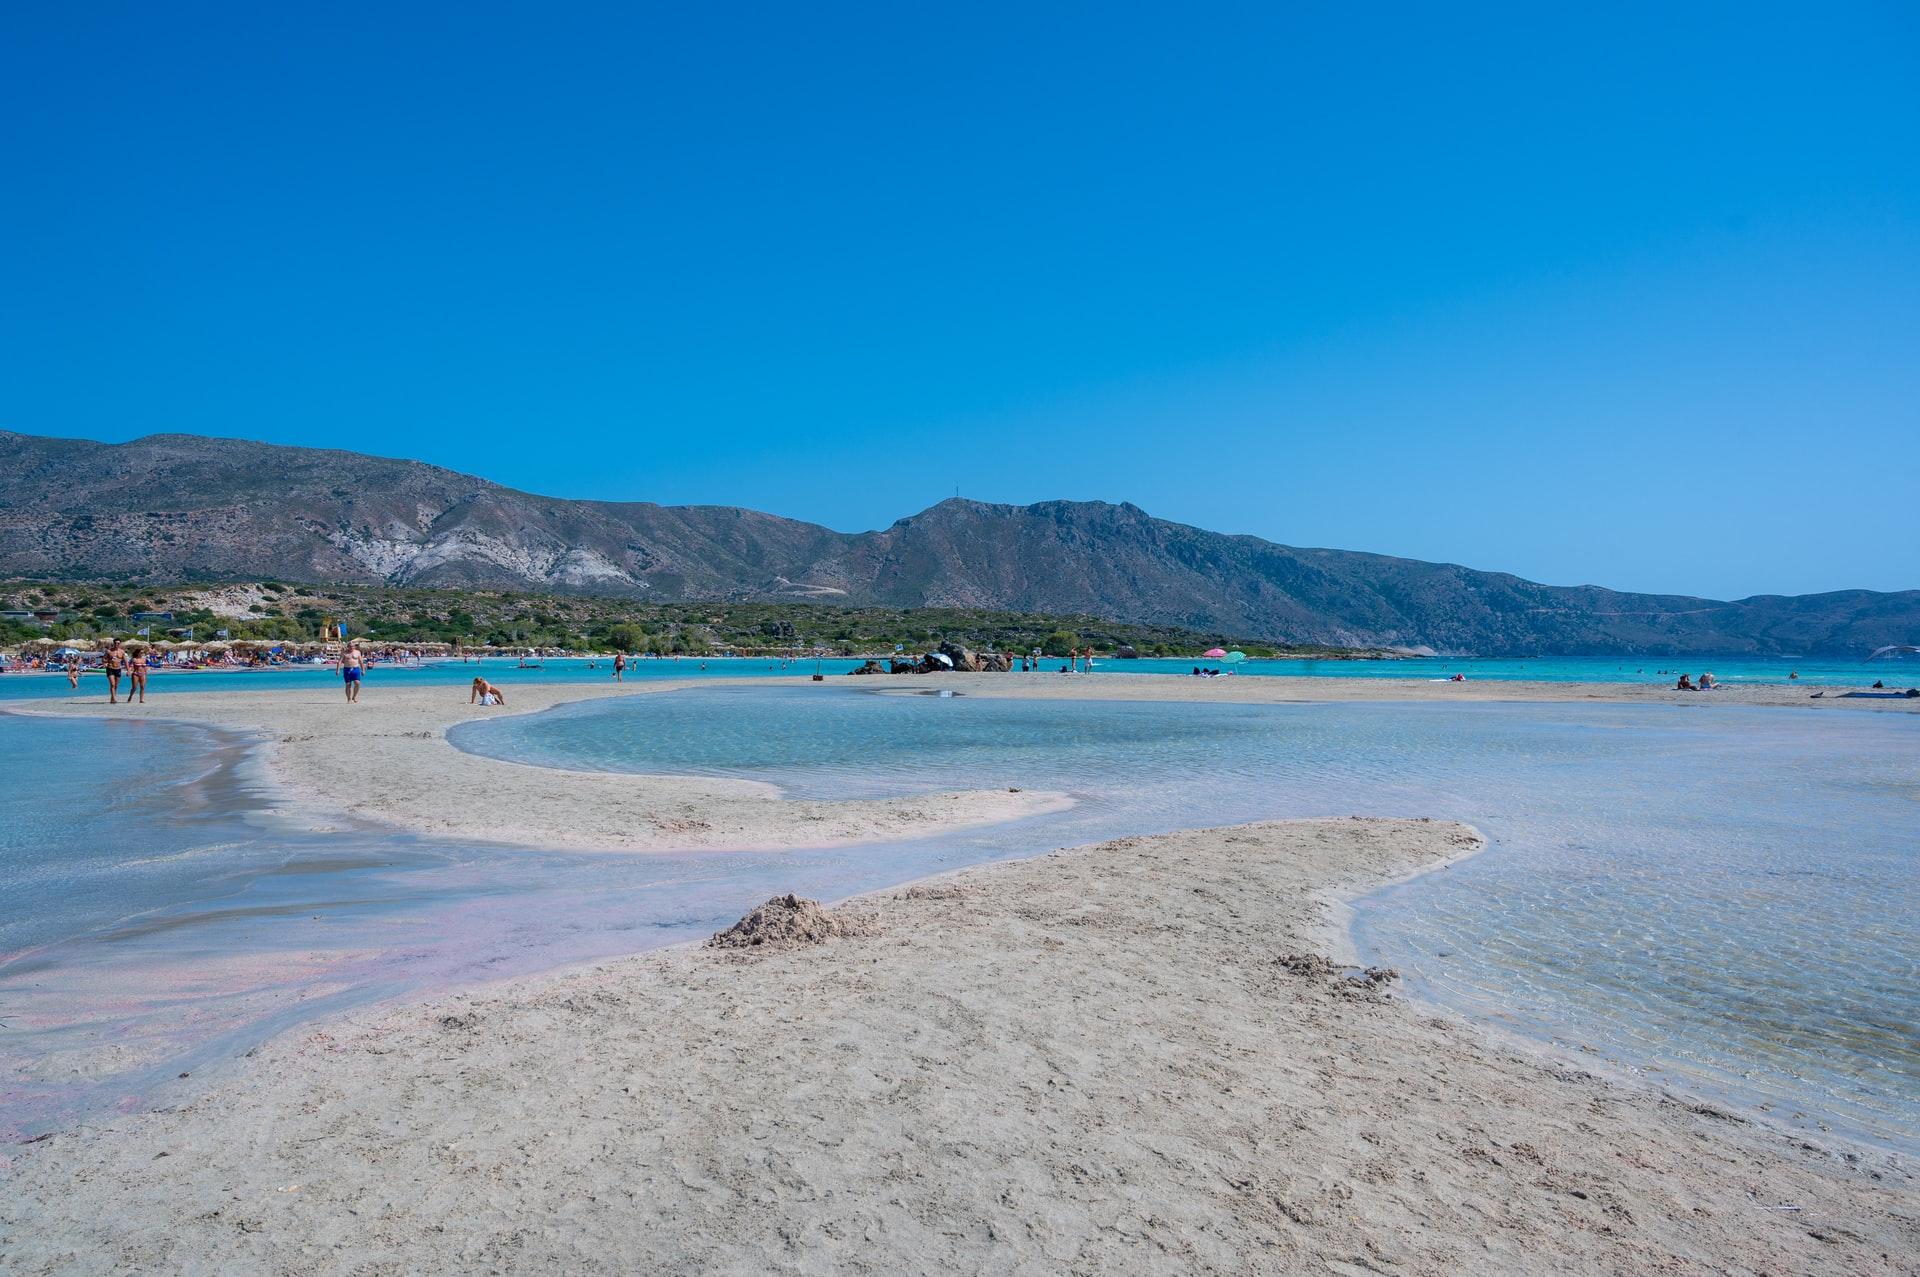 elafonissi beach kissamos grèce plage